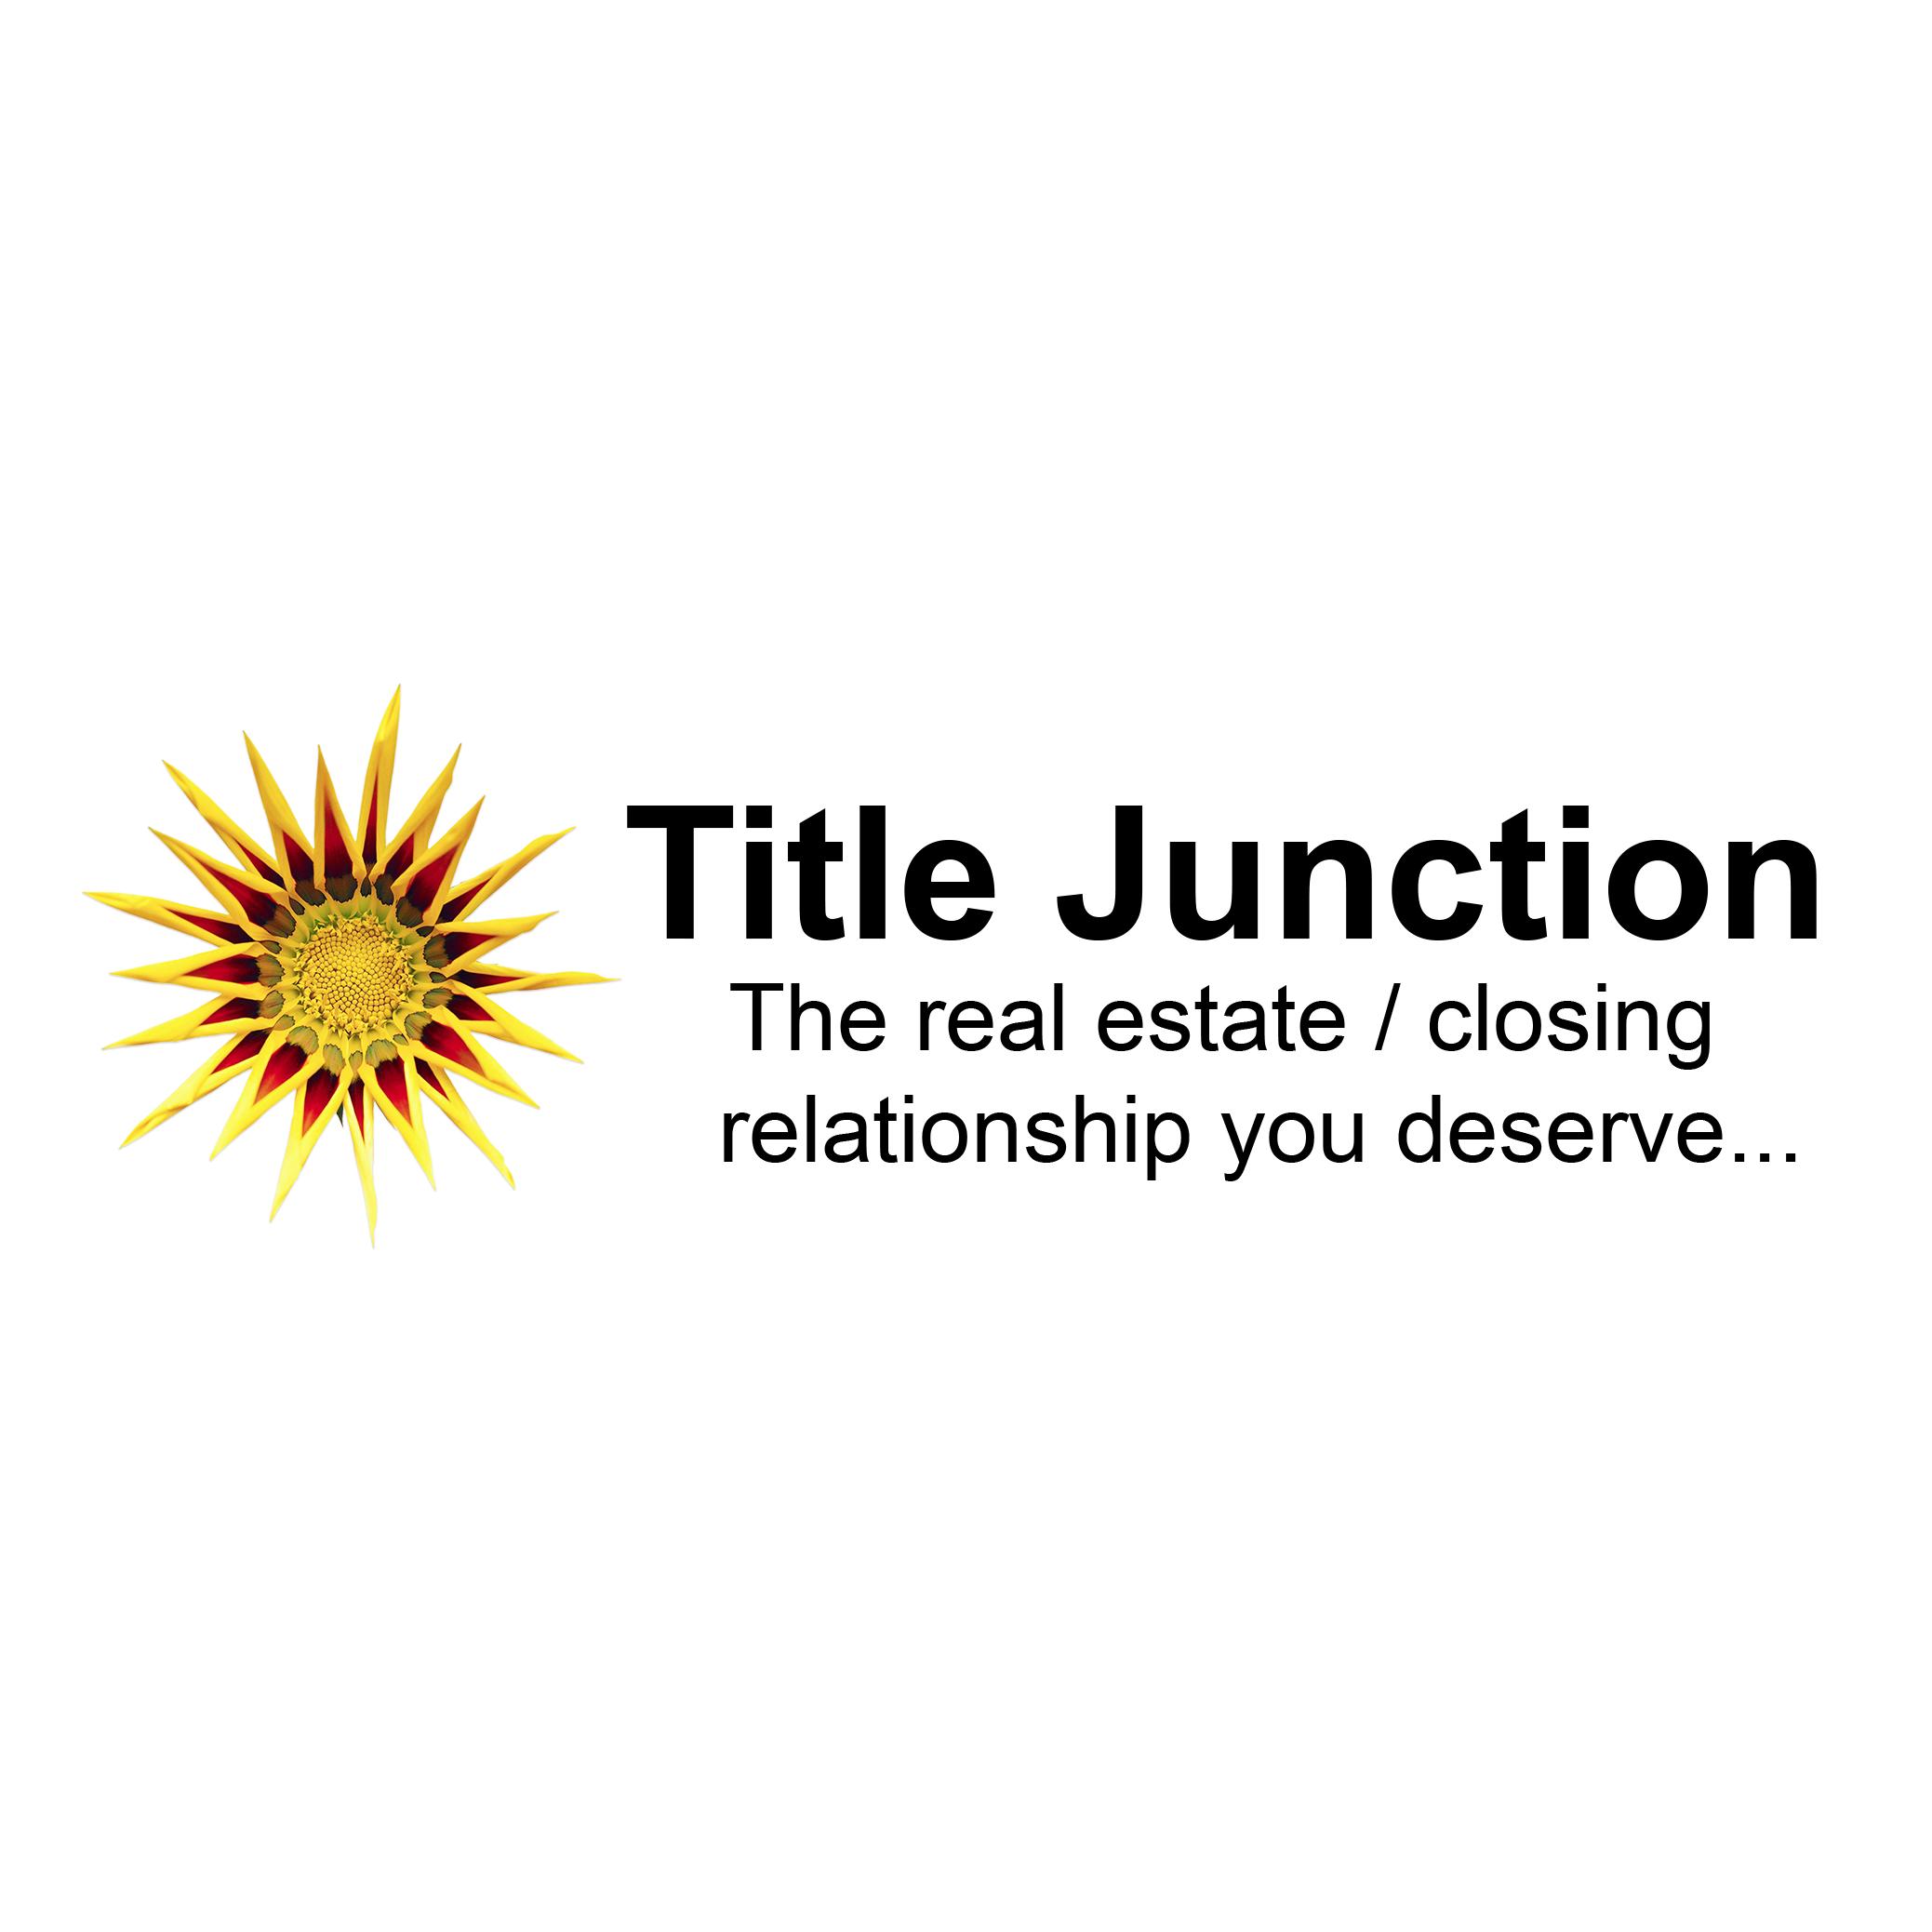 Title Junction LLC